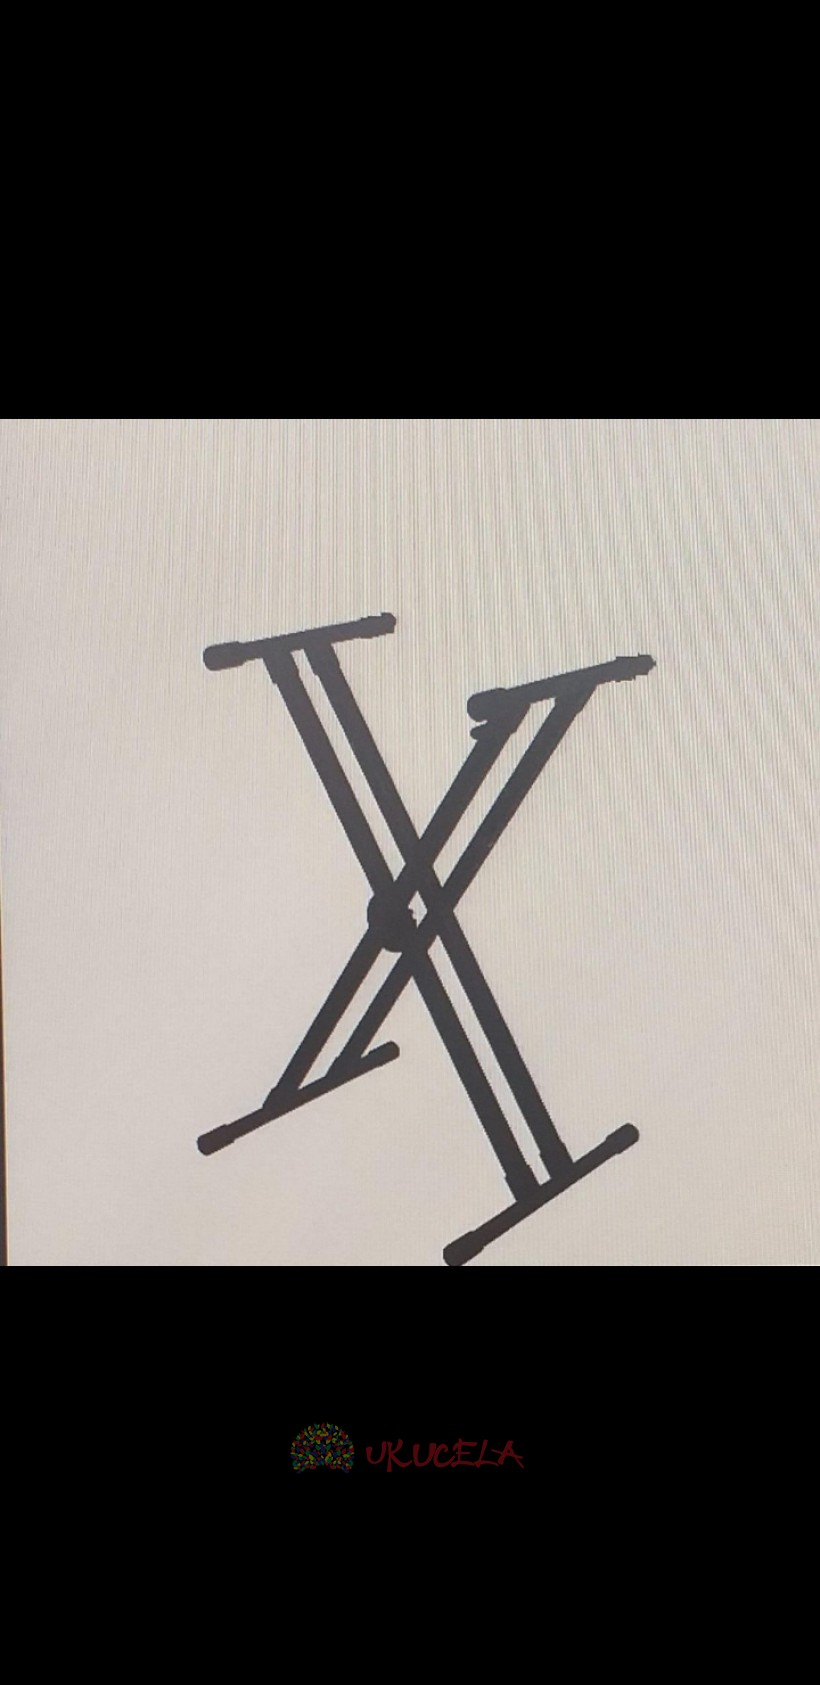 Atril teclado Rmx